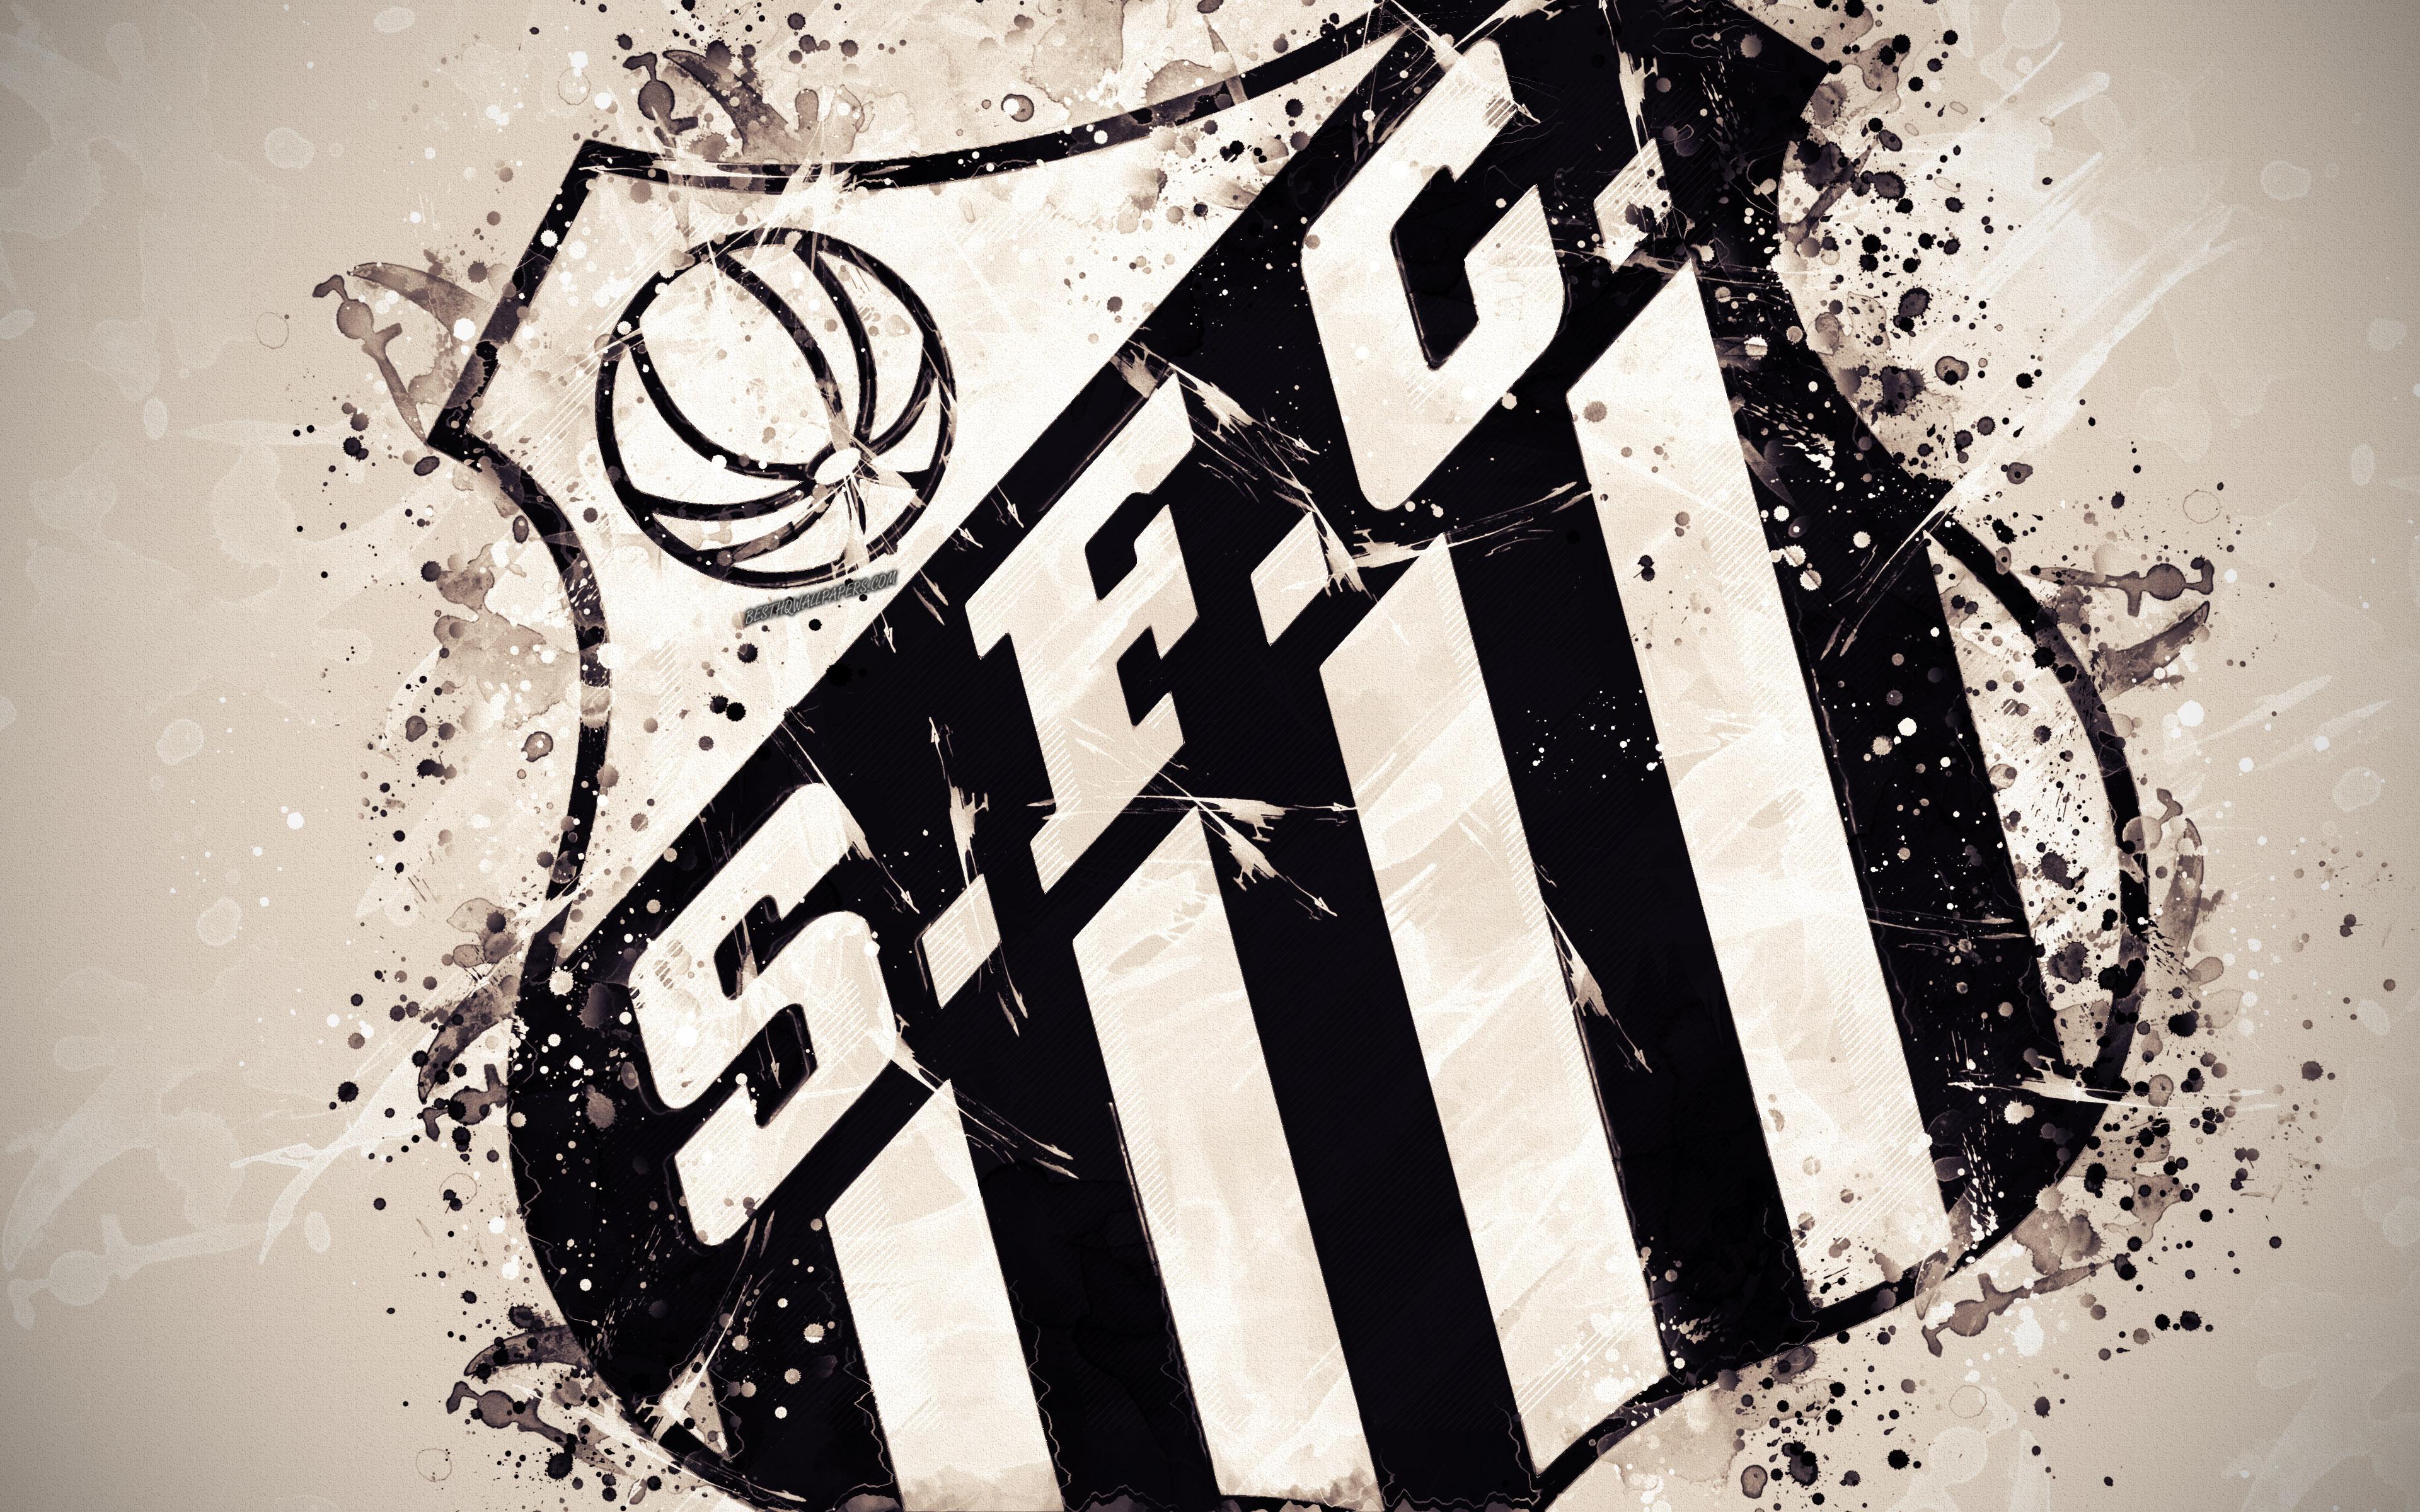 Download wallpapers Santos FC Santos Futebol Clube 4k paint art 3840x2400